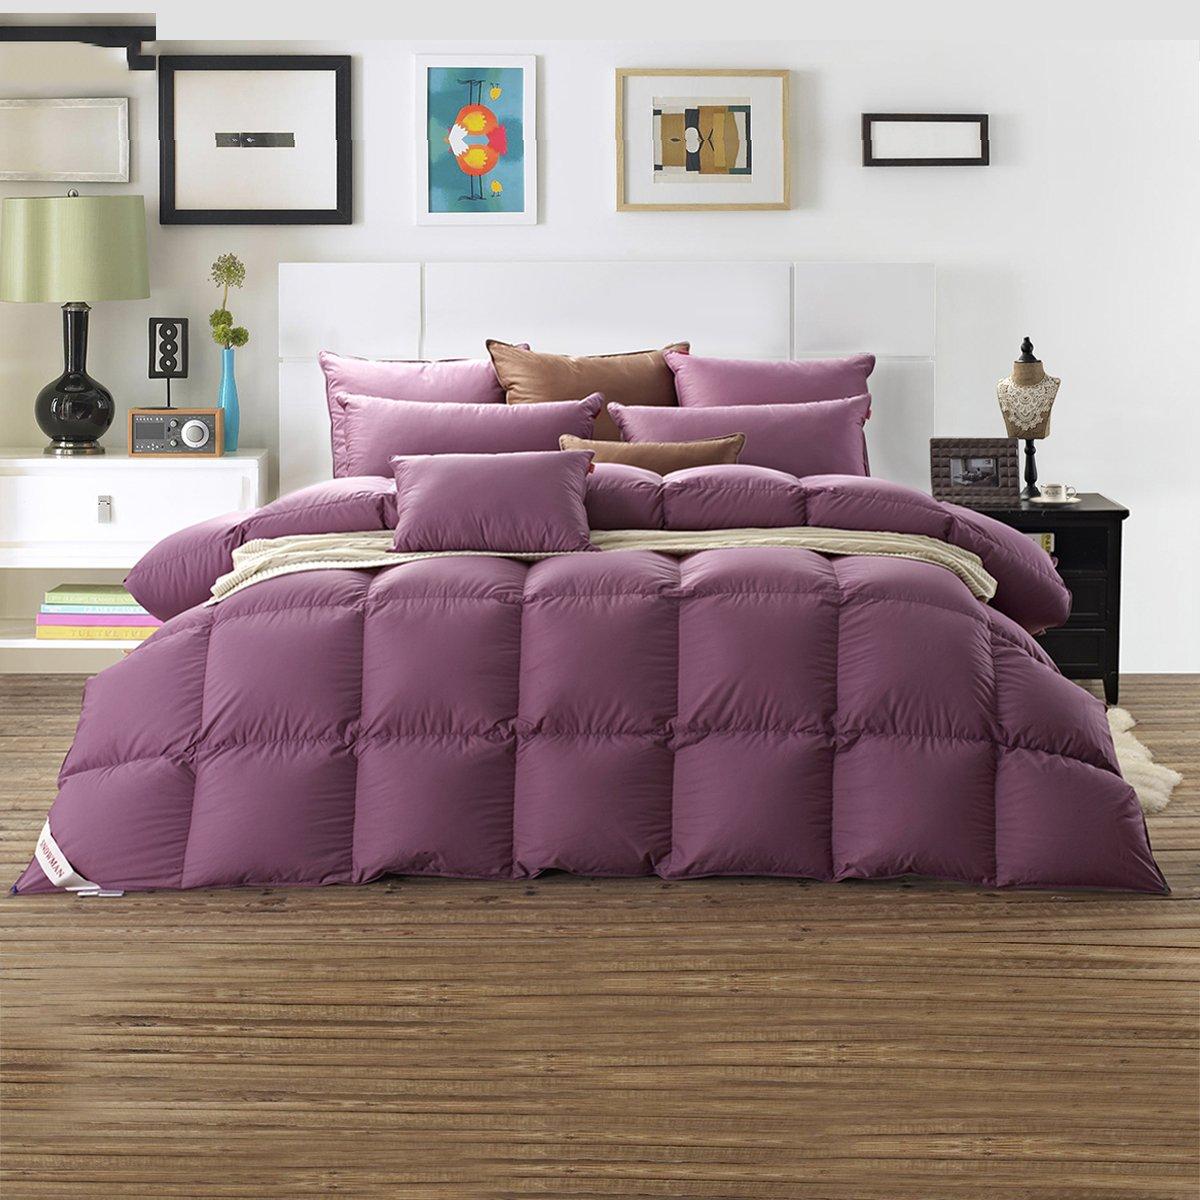 SNOWMAN Bedding Queen Size Goose Down Comforter,Baffle Box Construction,55oz,Purple